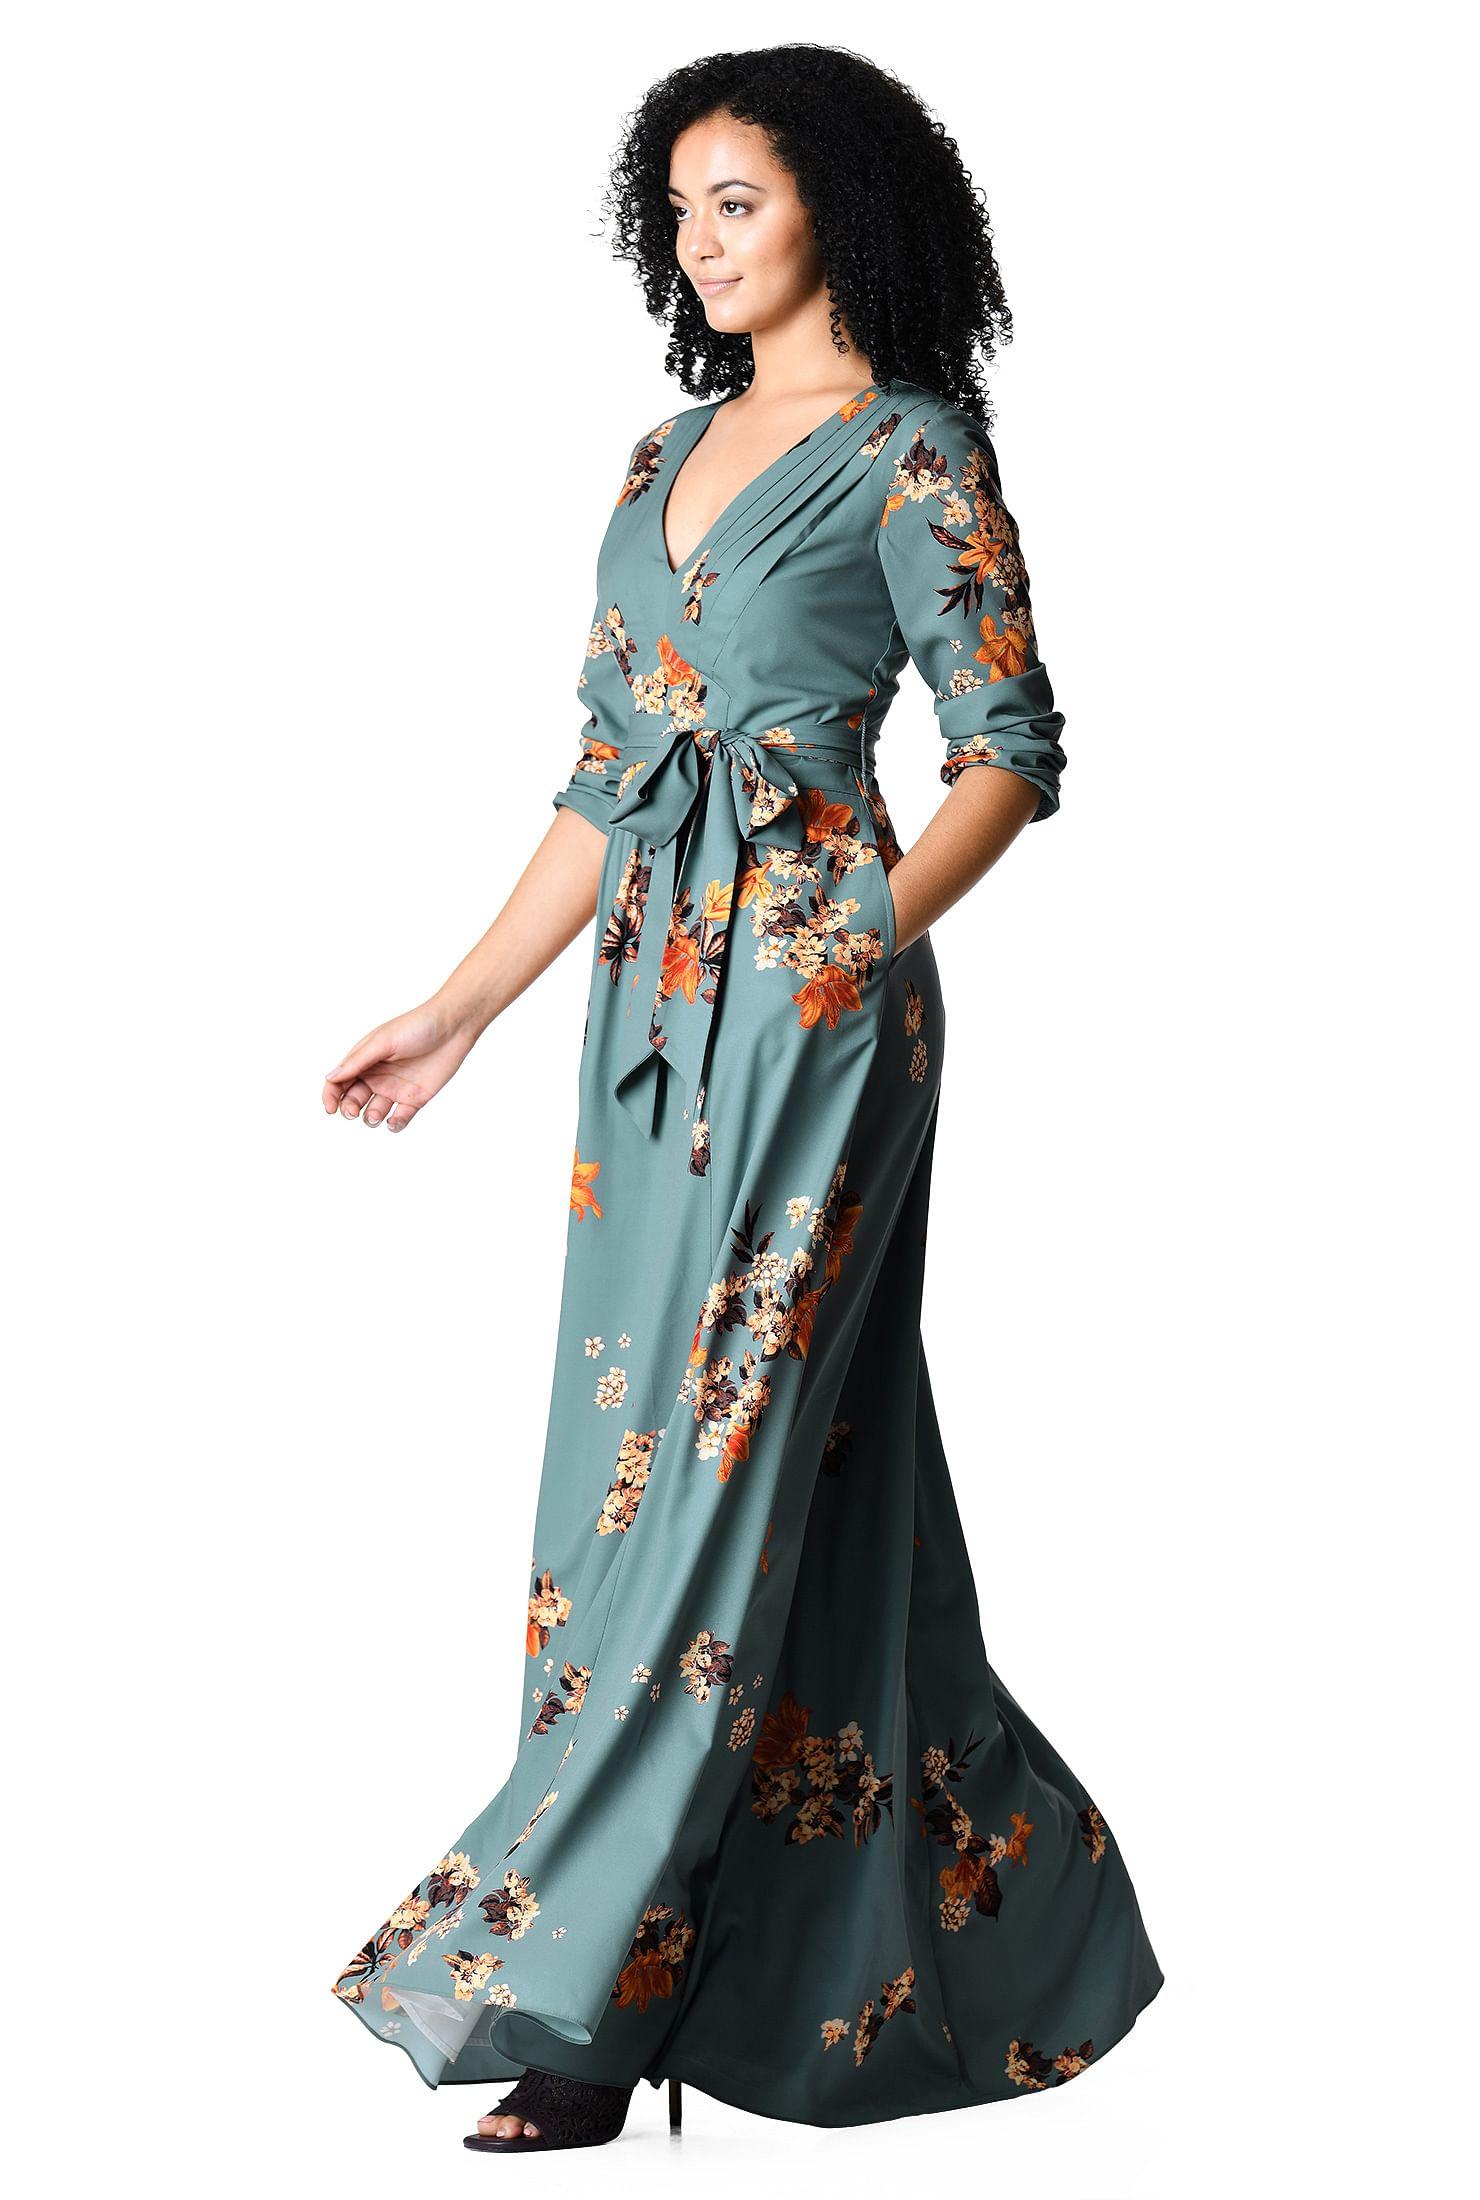 a8b0676b145 Women s Fashion Clothing 0-36W and Custom